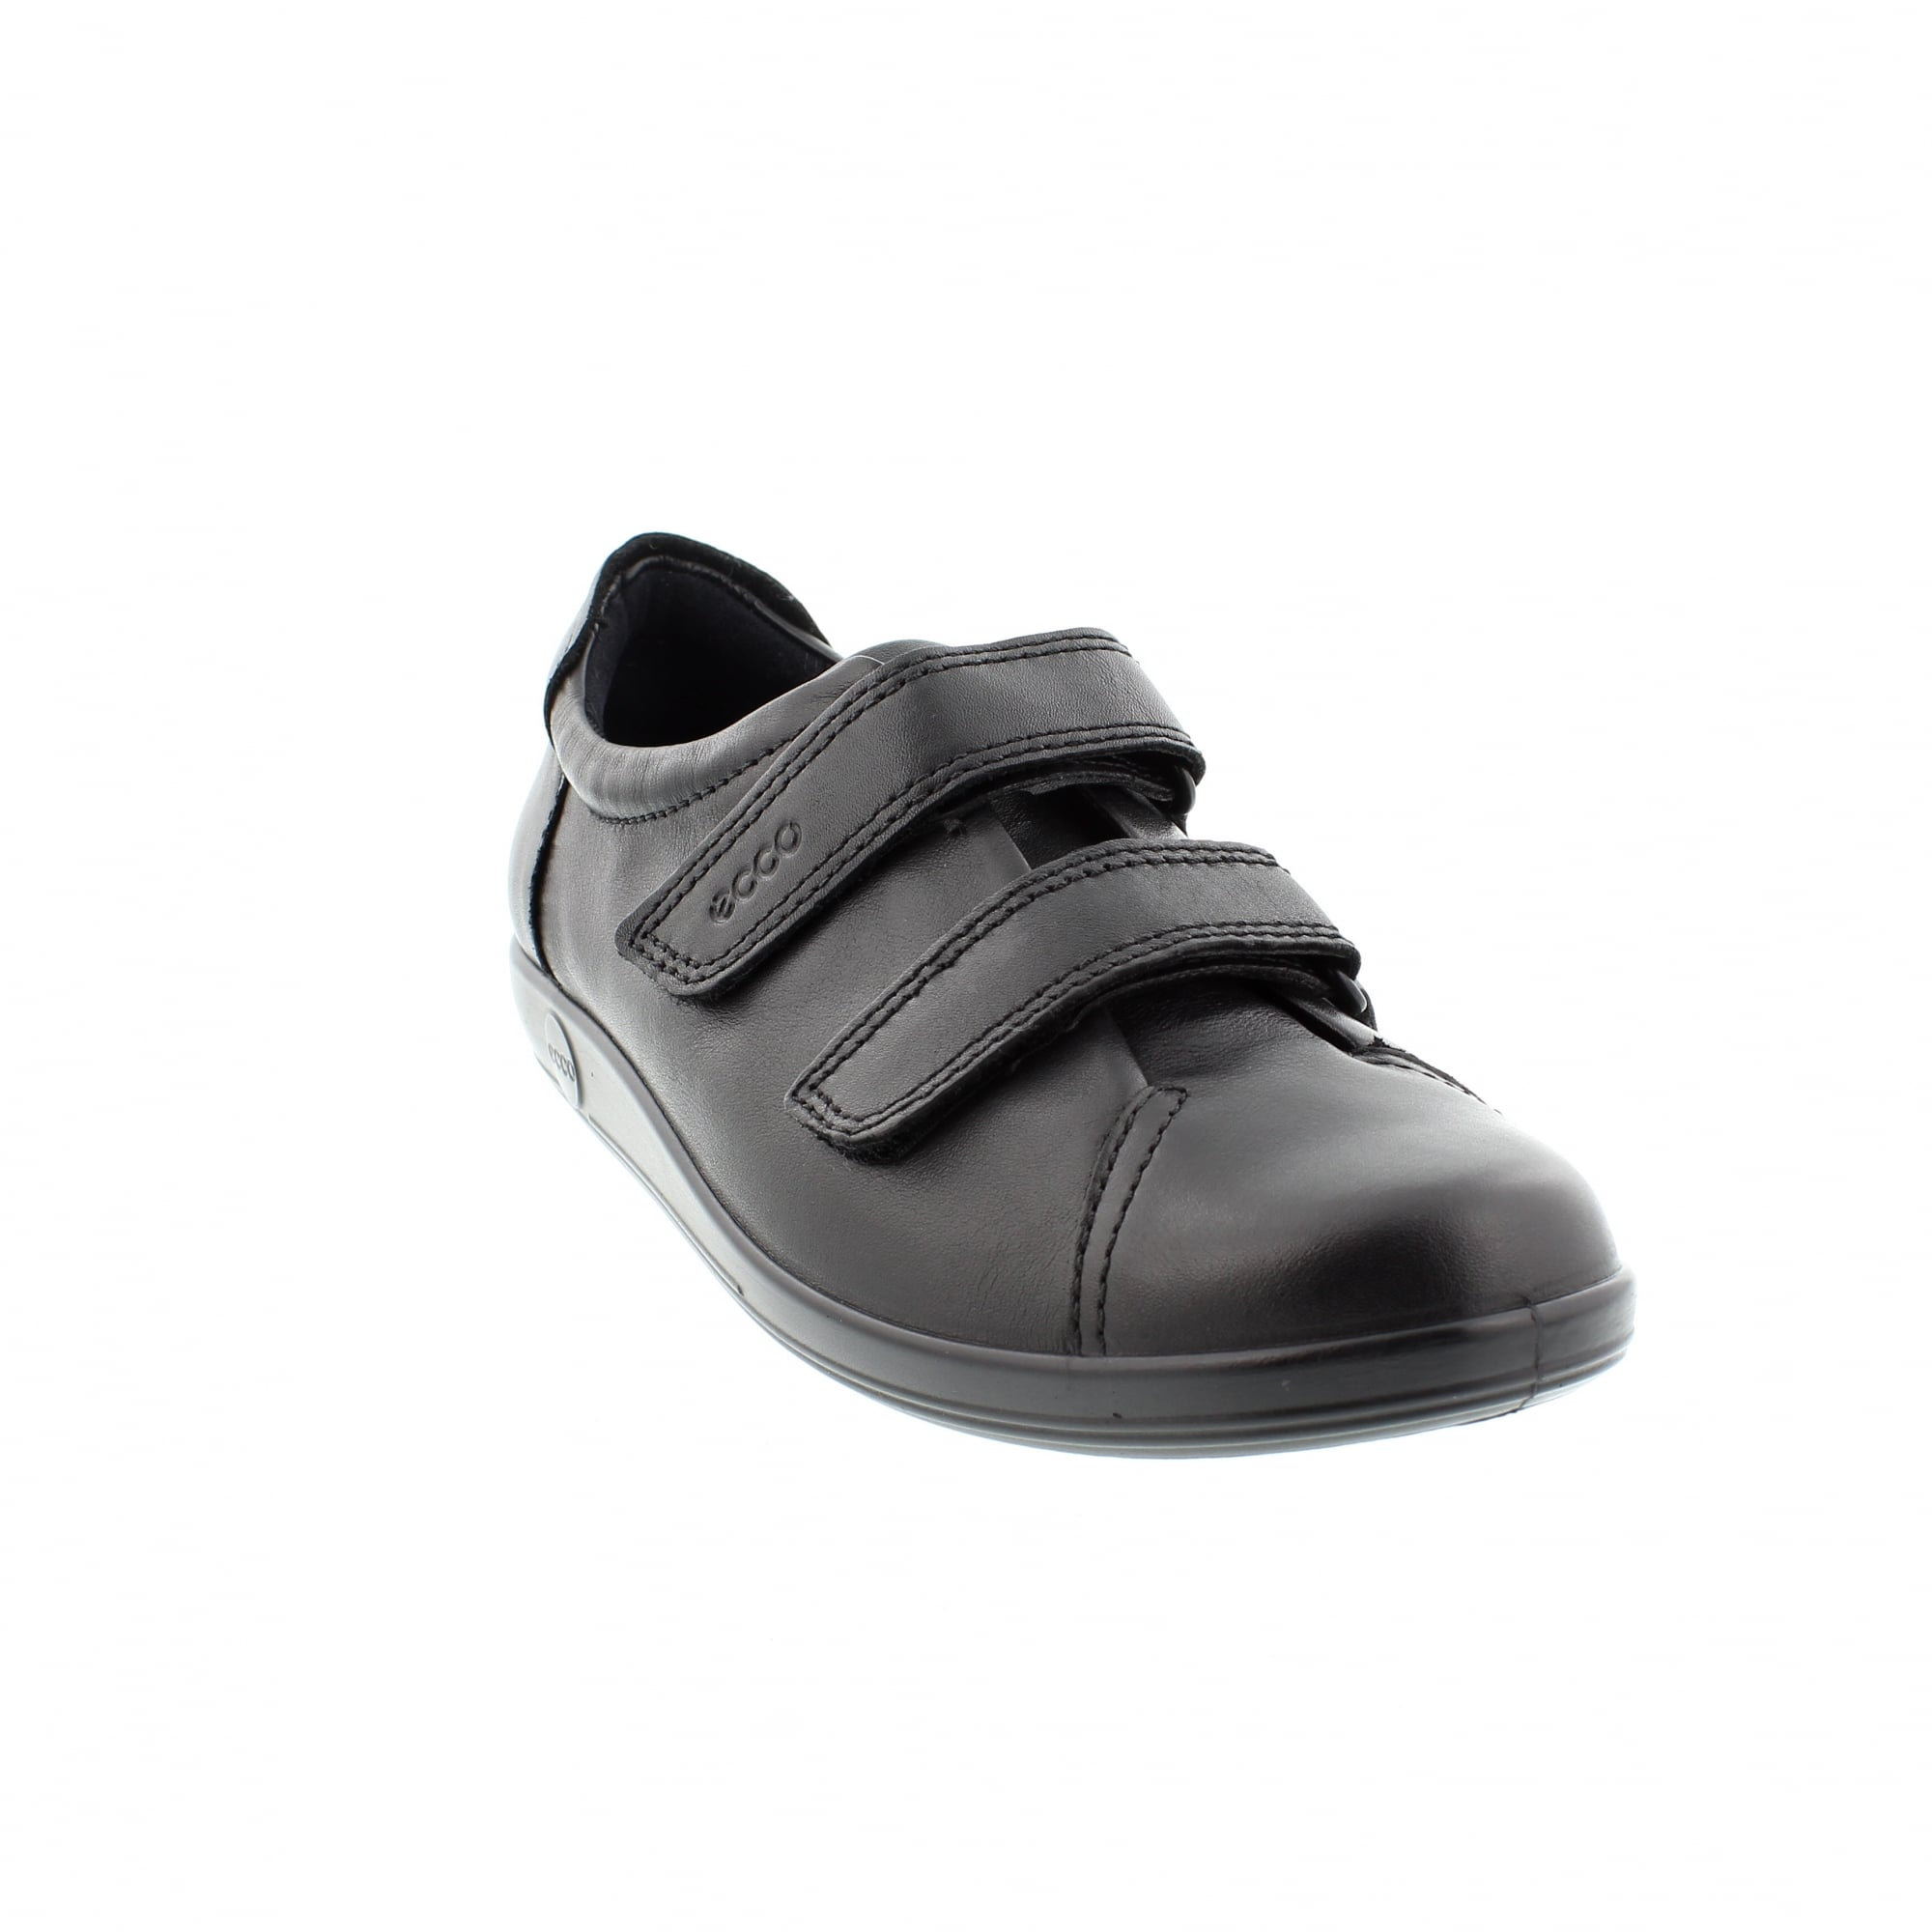 fe66dd4b5869 Ecco Soft 2.0 206513-56723 Womens Shoes